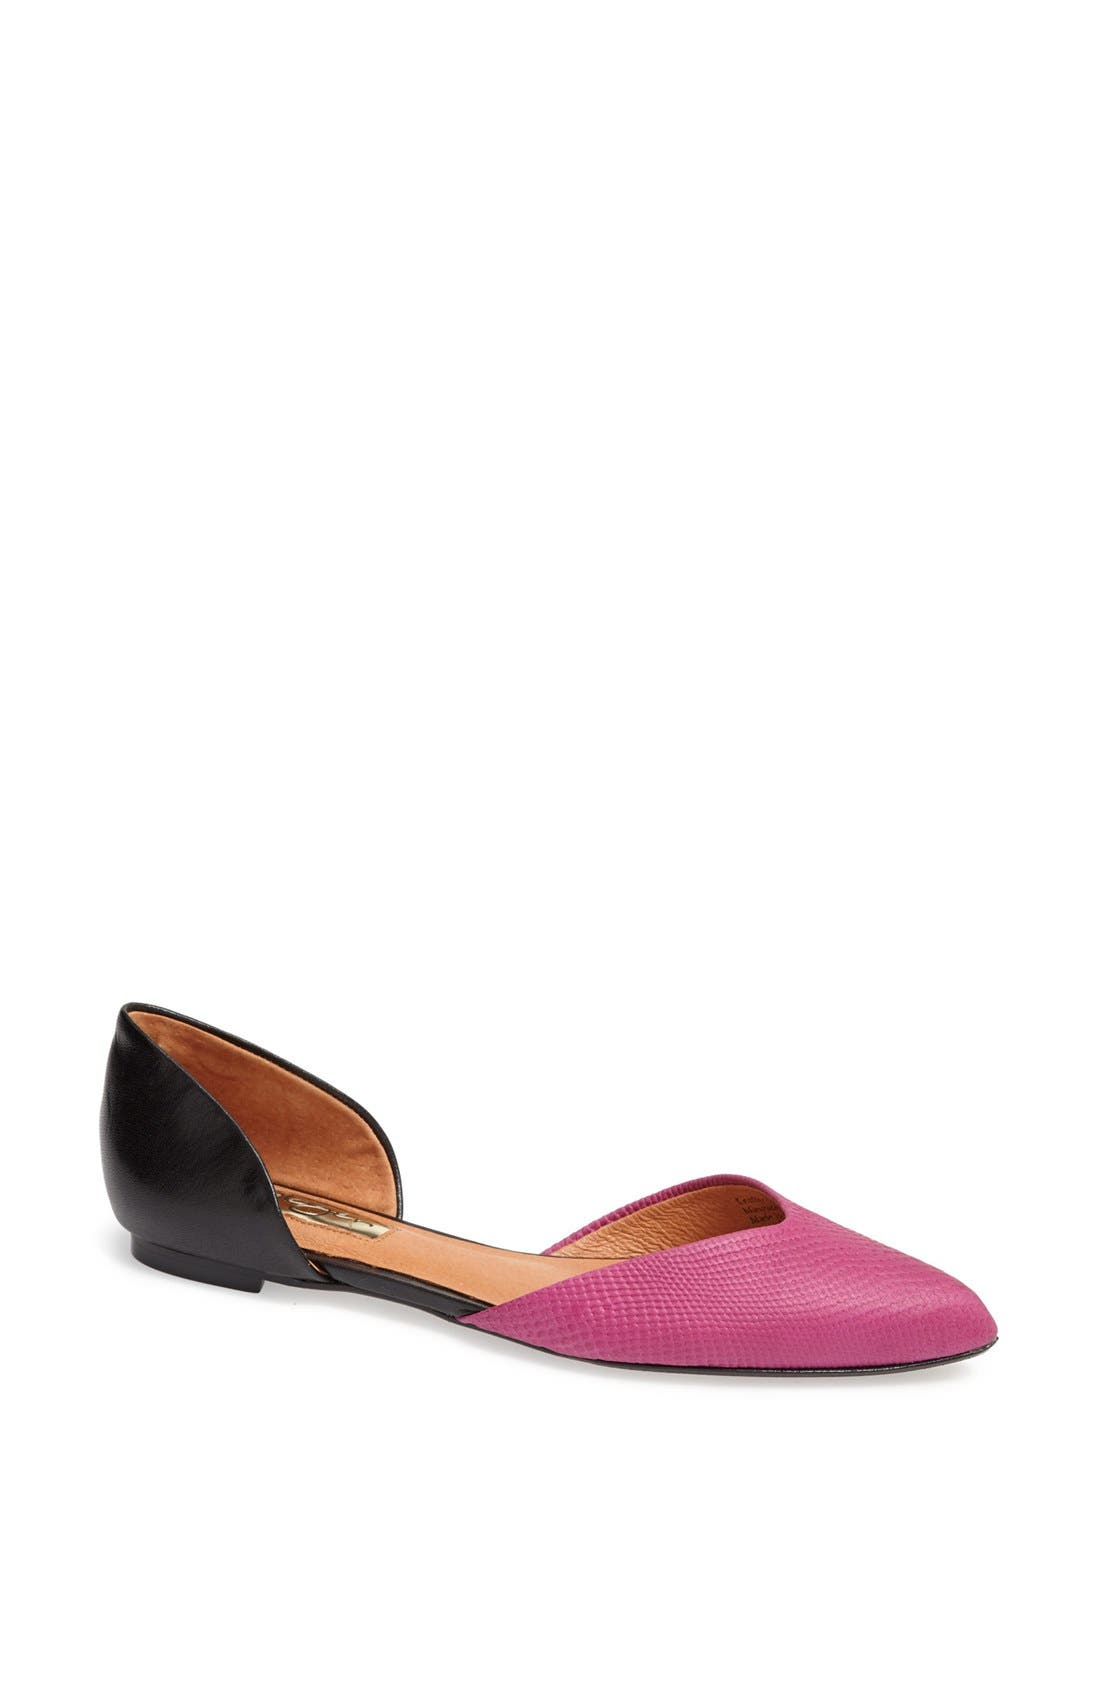 'Leta' d'Orsay Flat,                         Main,                         color, Magenta/ Black Nappa